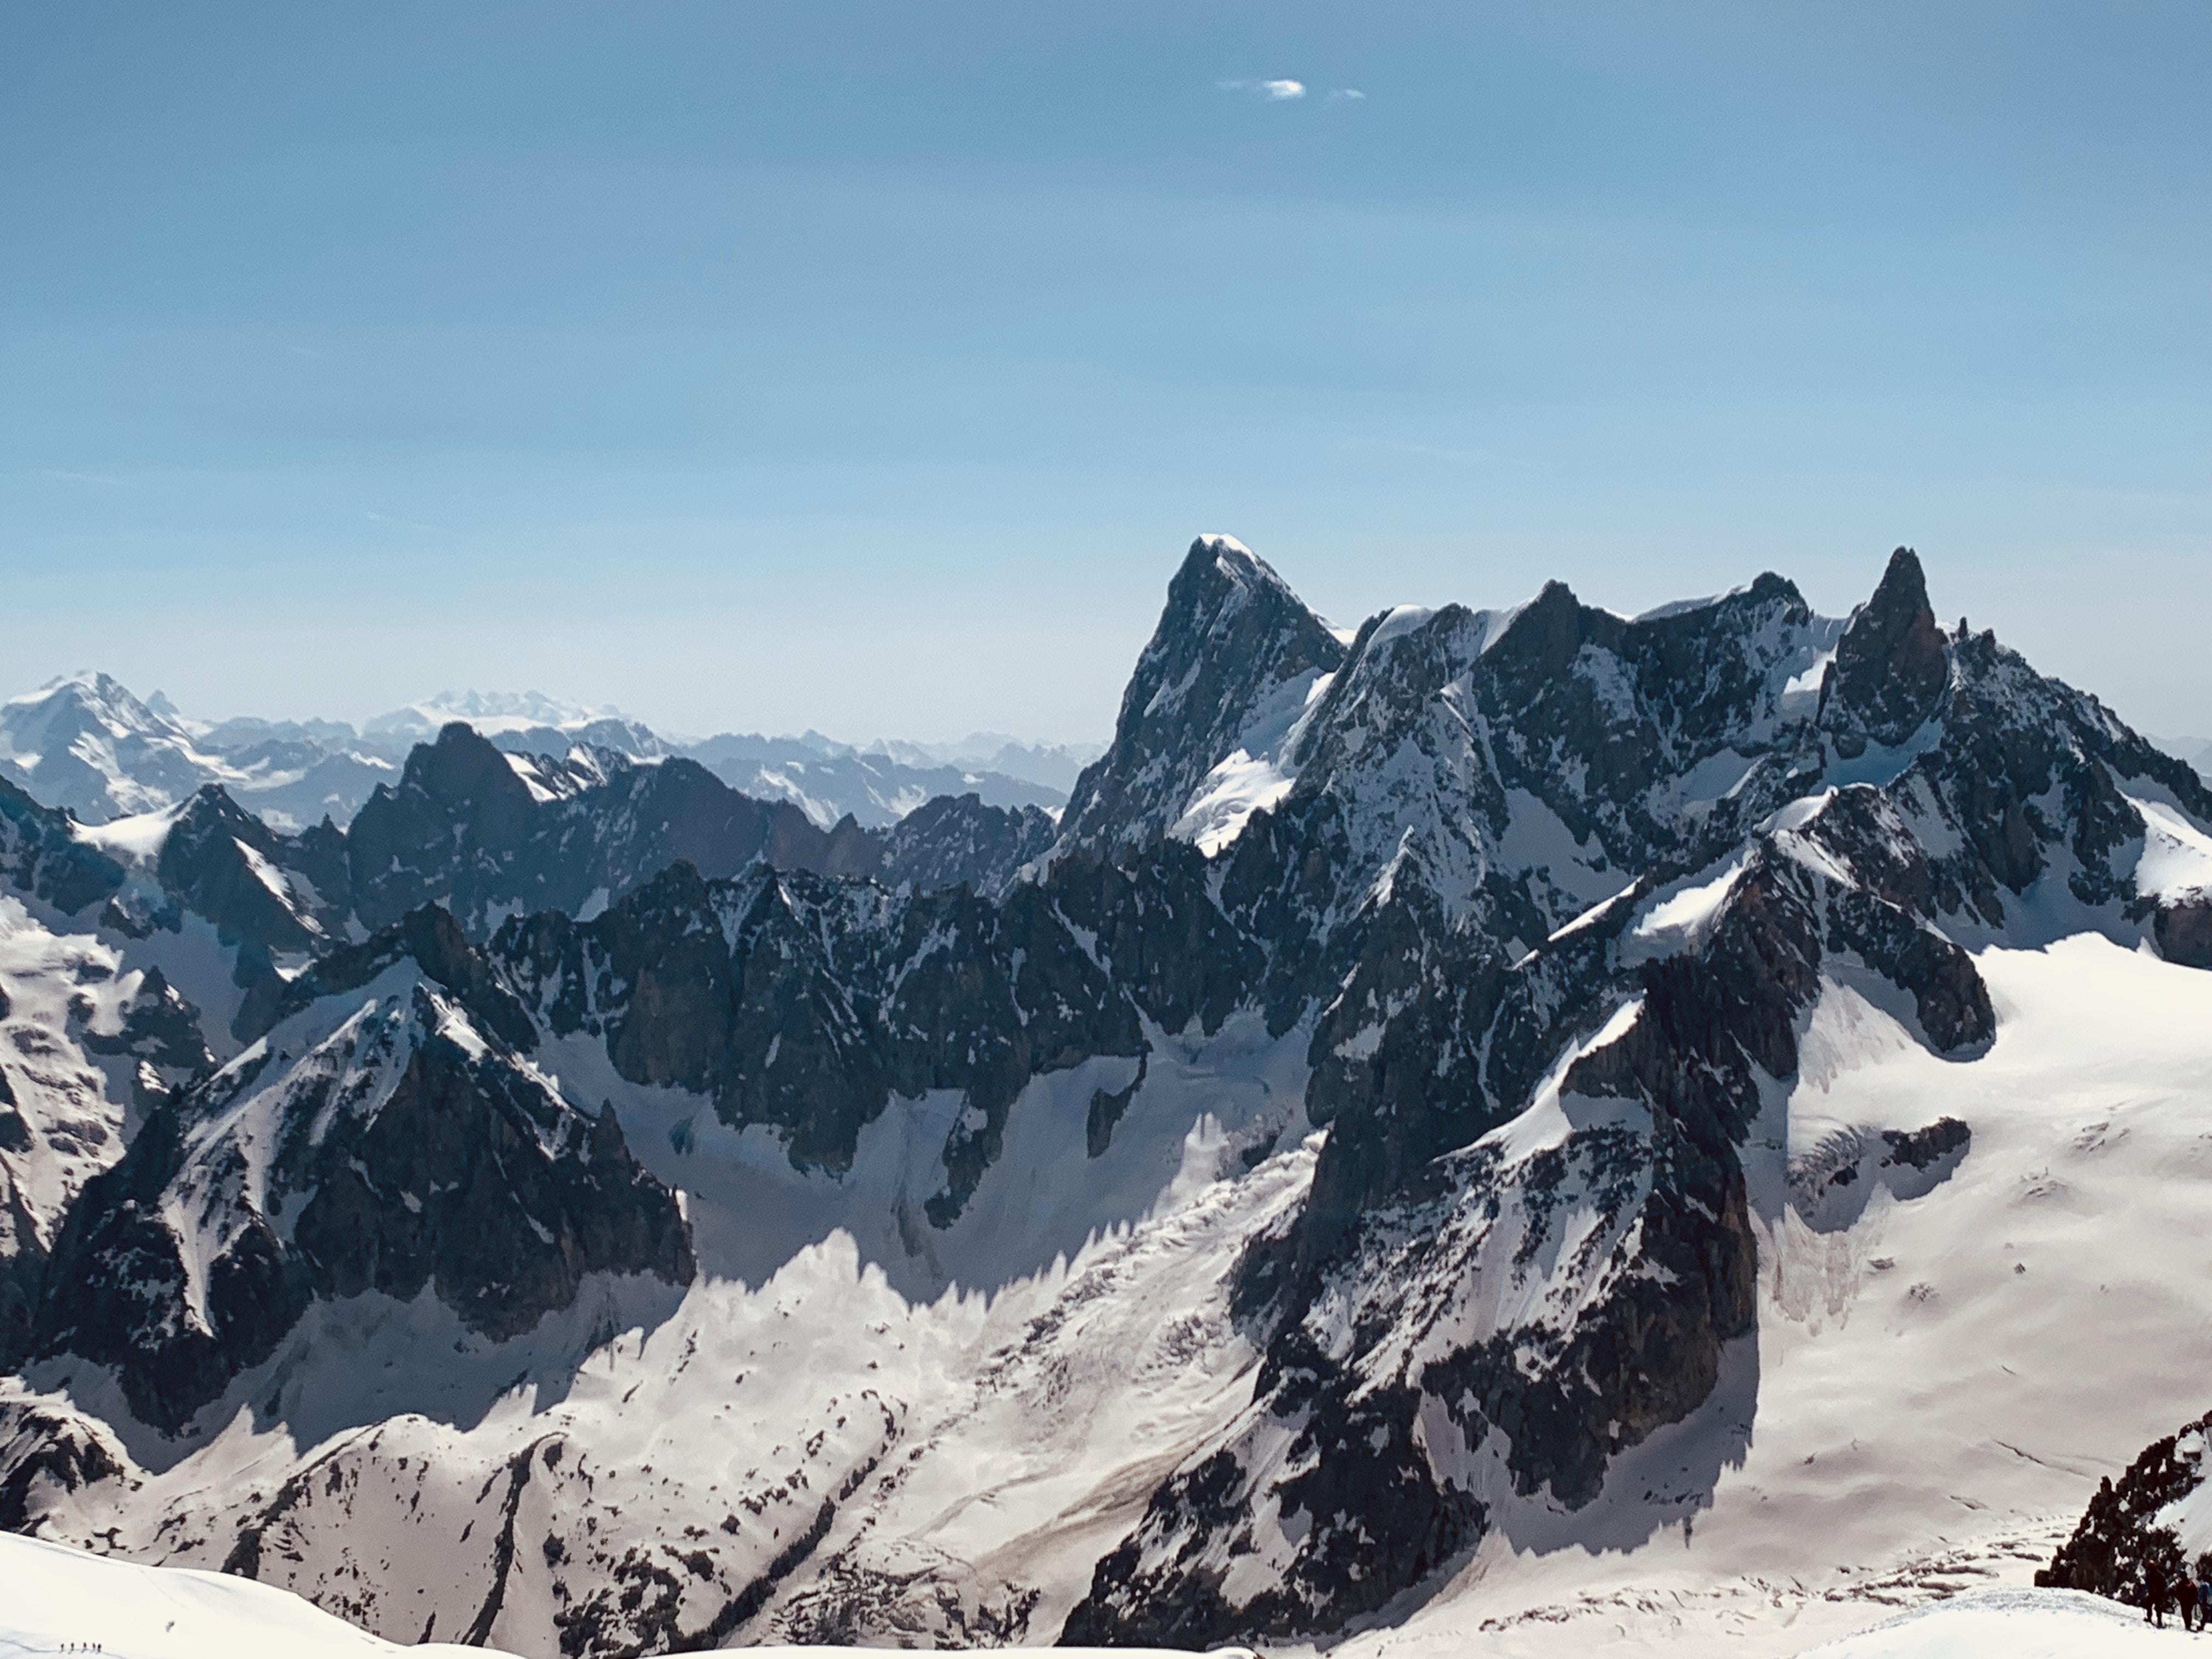 霞慕尼勃朗峰、羅納-阿爾卑斯、法國 Chamonix Mont Blanc, Girona-Alpes, France